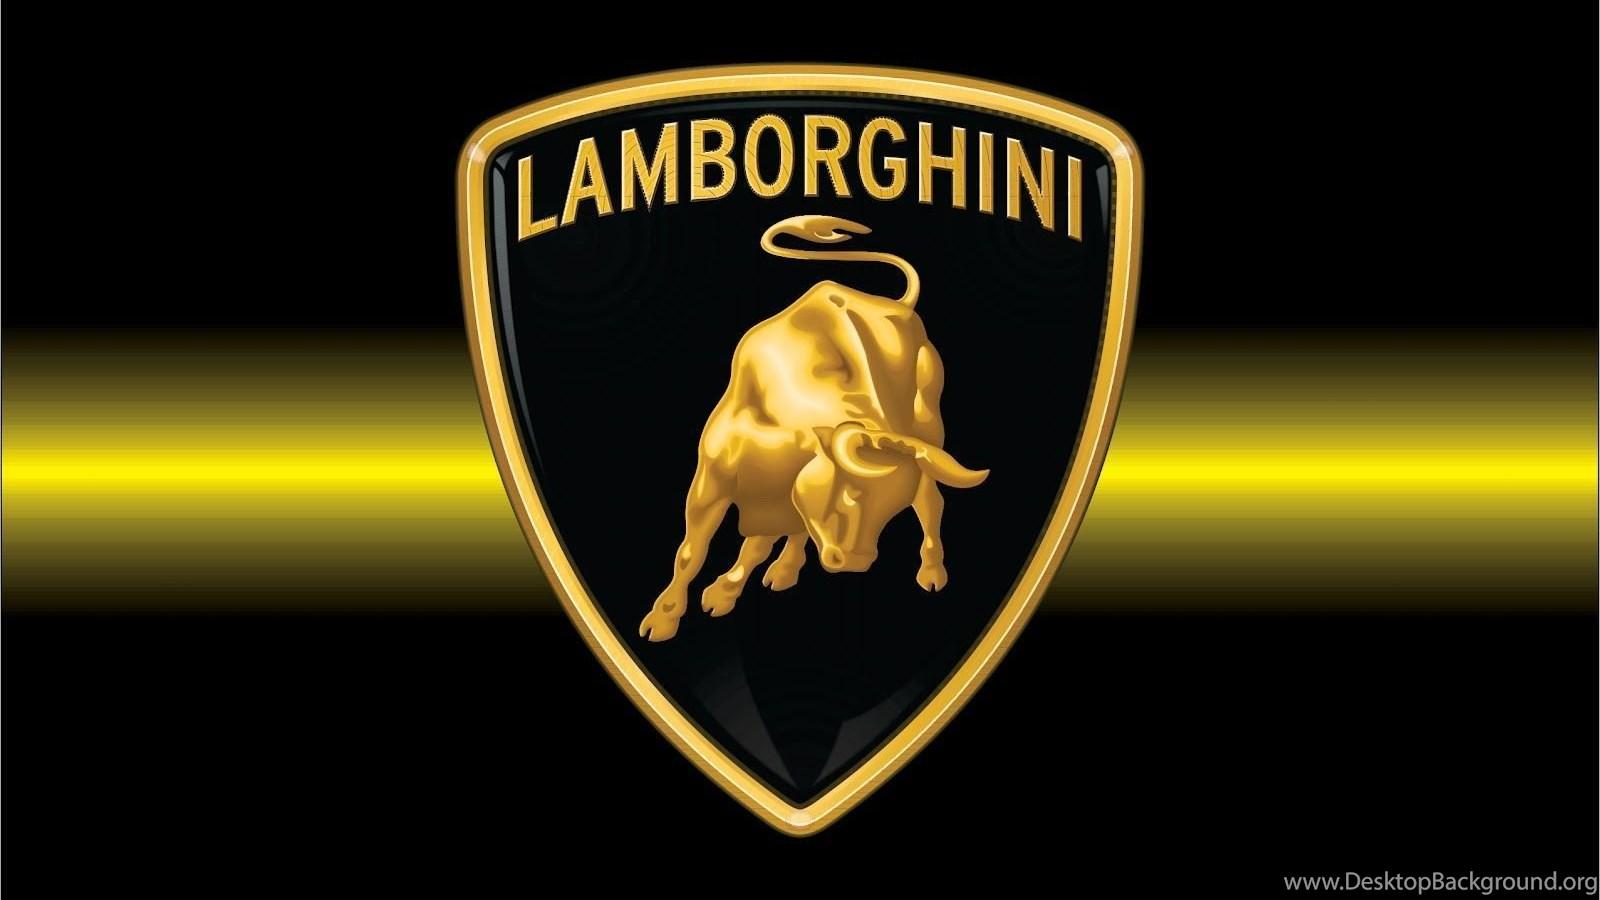 Lamborghini Logo Wallpapers 3d Image Desktop Background